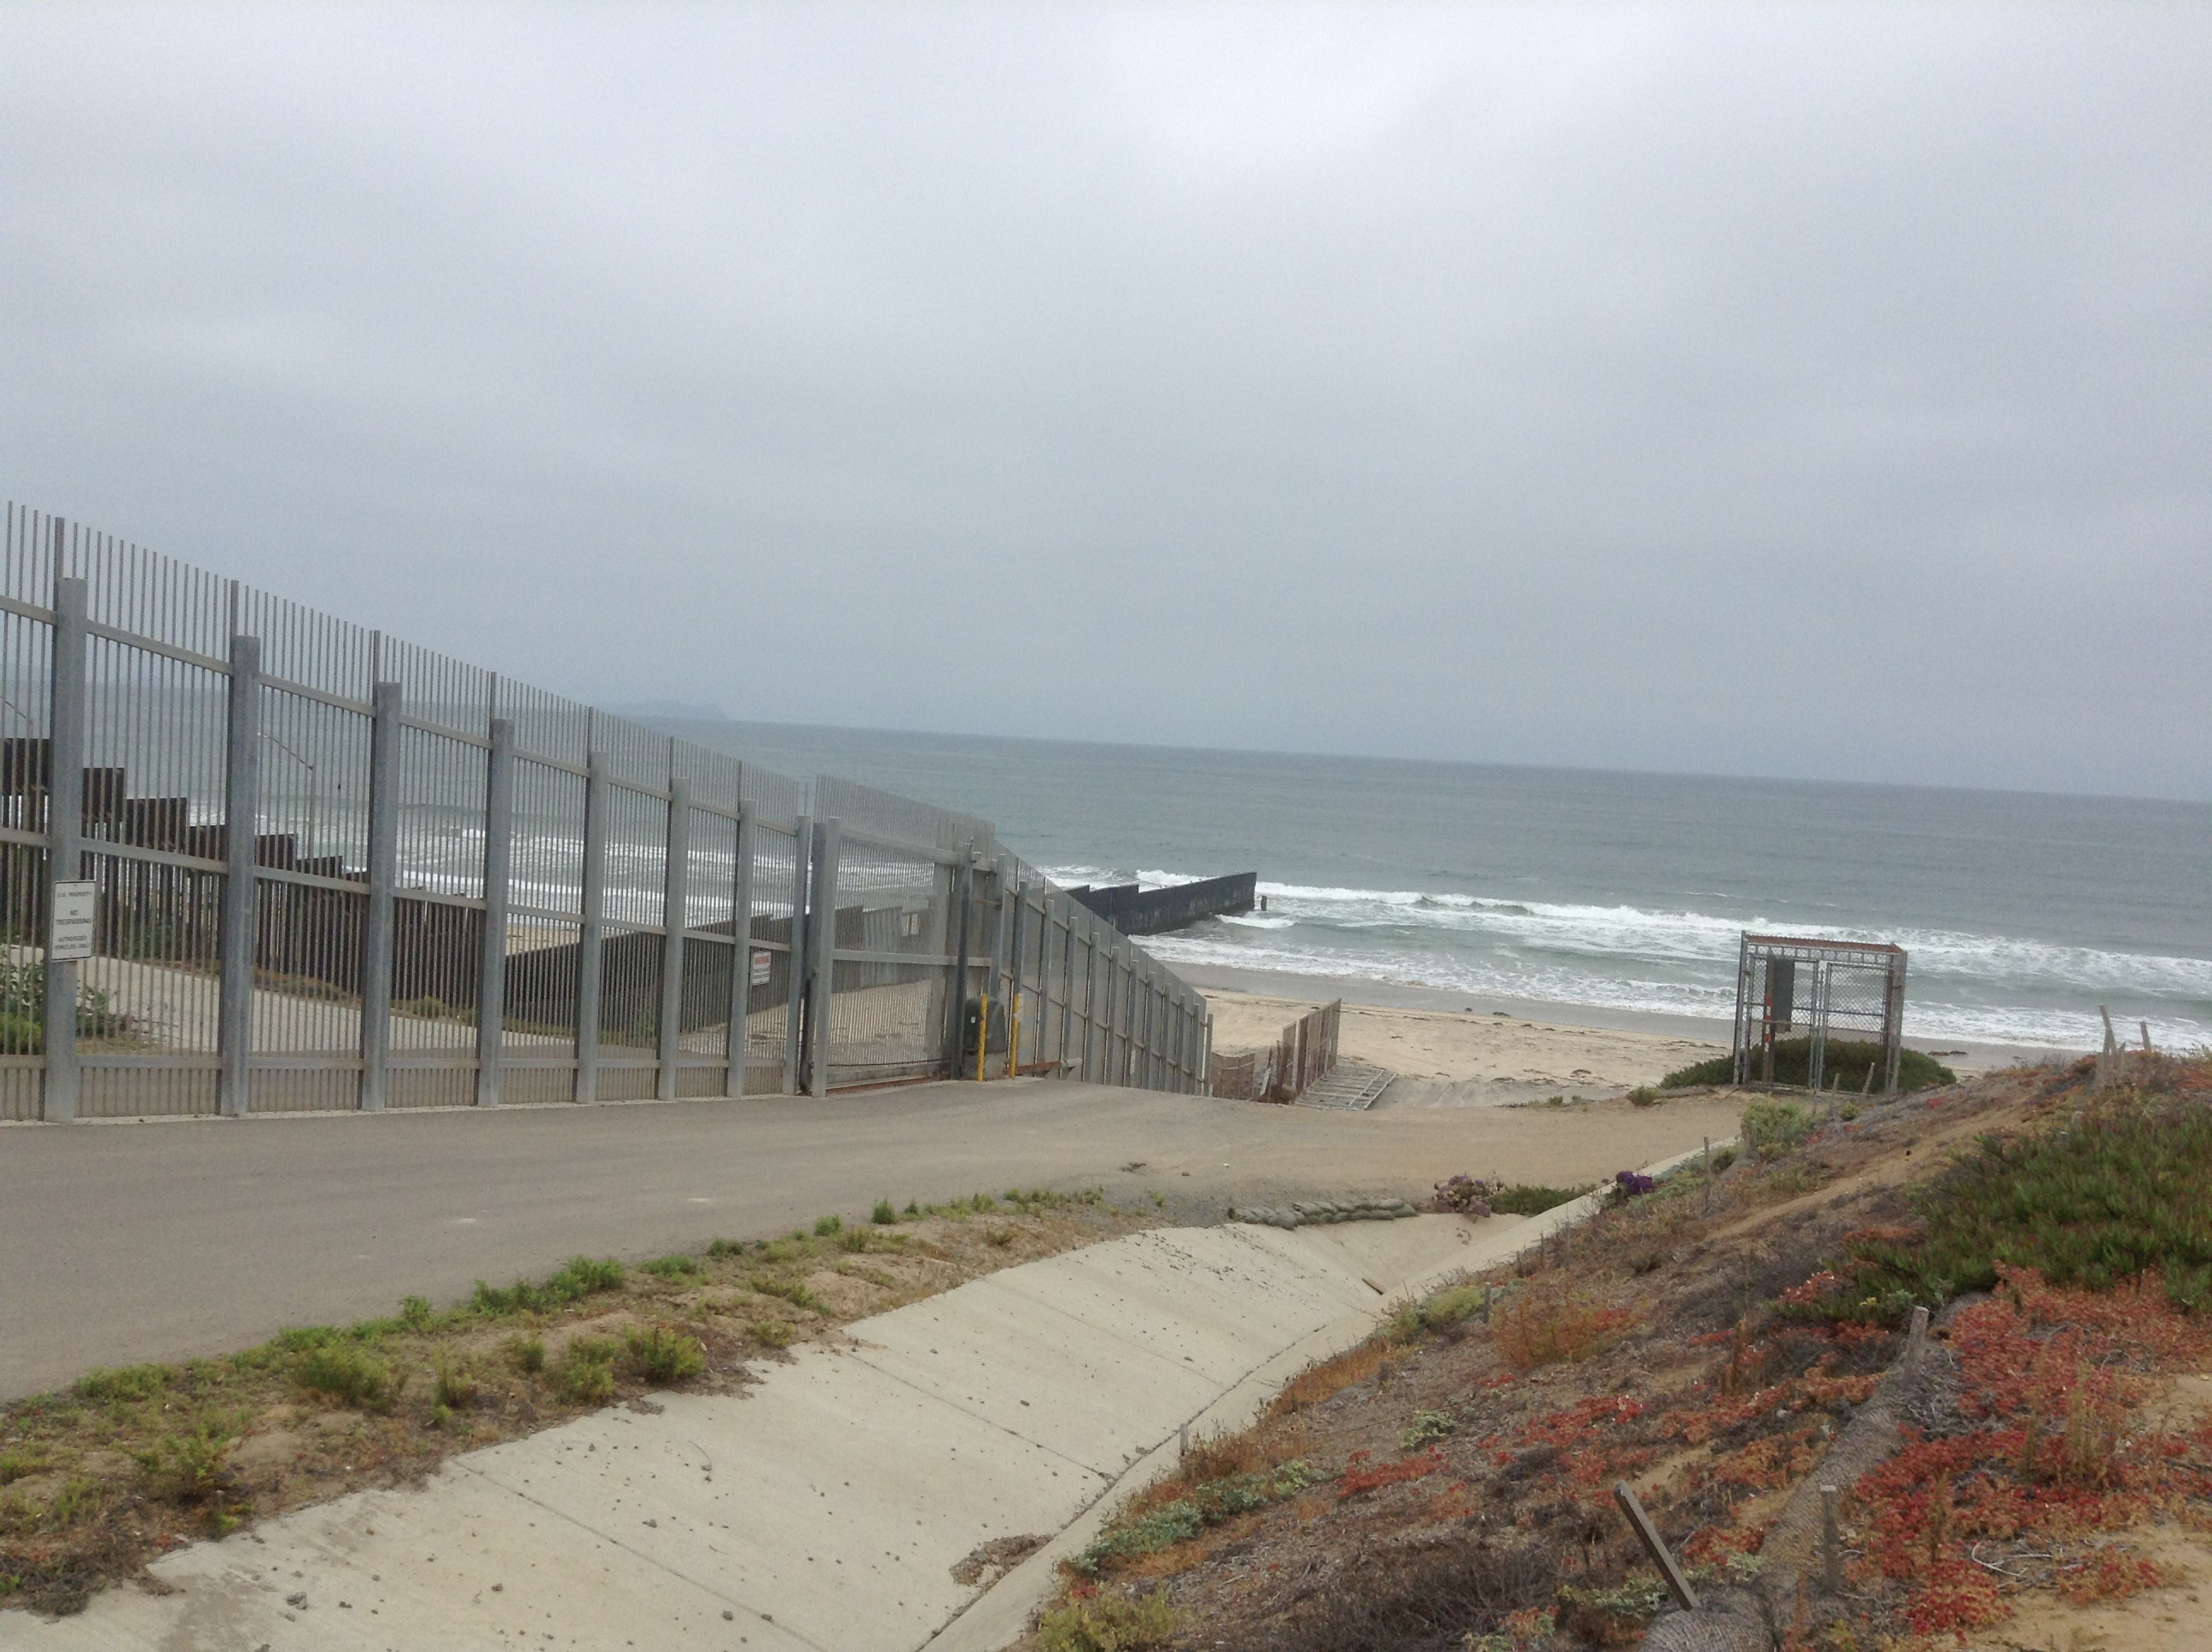 fences fear and friendship park